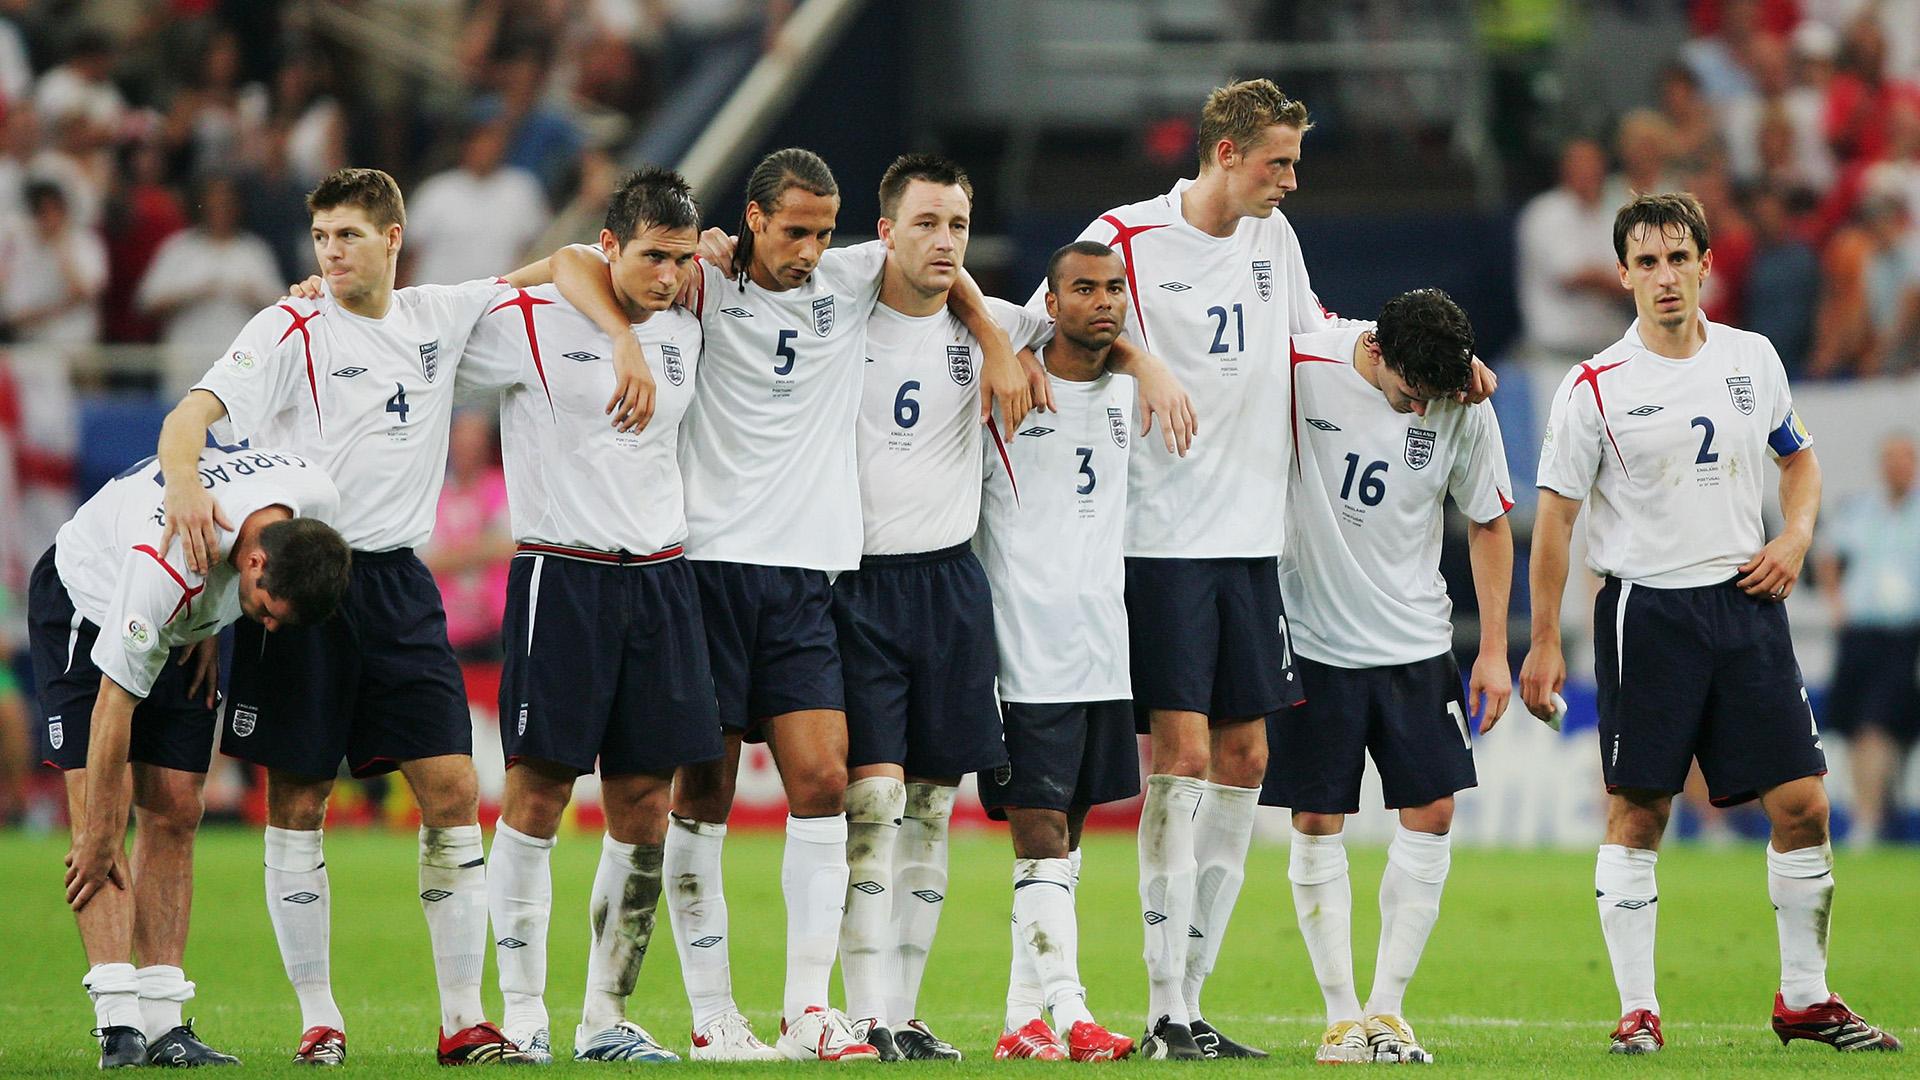 England 2006 World Cup